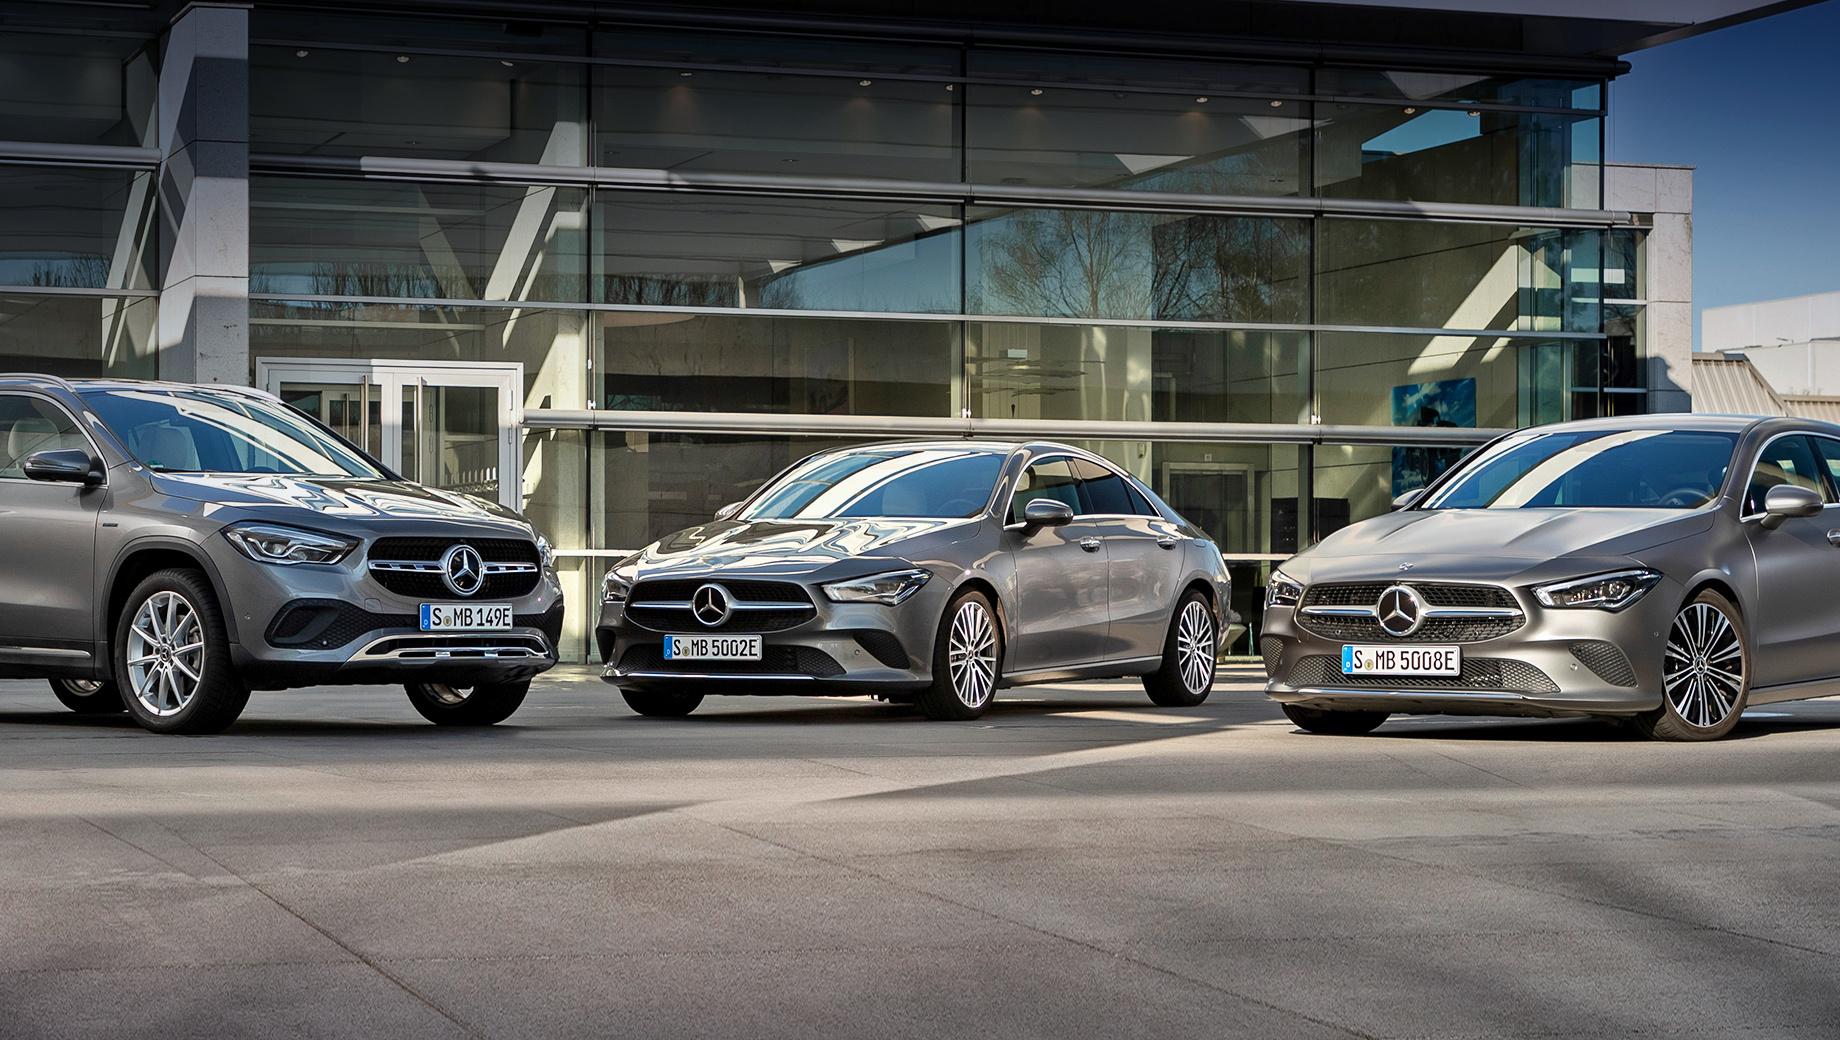 Mercedes gla,Mercedes cla,Mercedes cla shooting brake. Зарядка батареи с 10% до 80% от станции постоянного тока на 24 кВт длится 25 минут. Настенный терминал переменного тока (7,4 кВт) требует на пополнение с 10% до 100% один час и 45 минут.